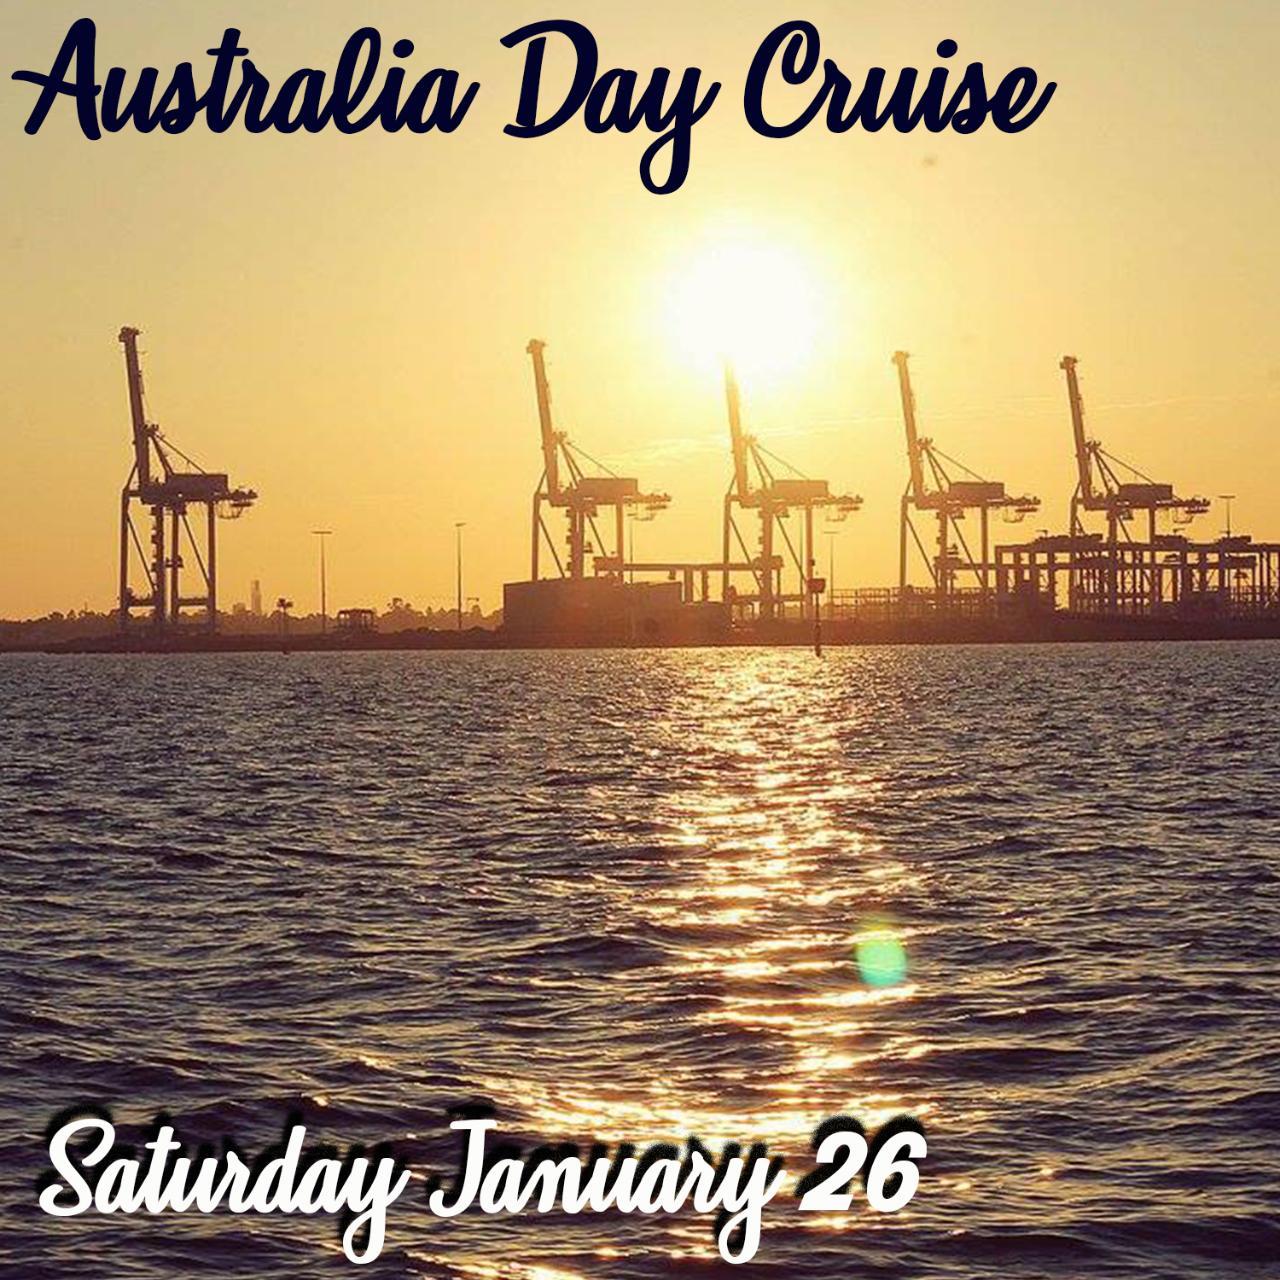 Australia Day Scenic Sightseeing Cruise